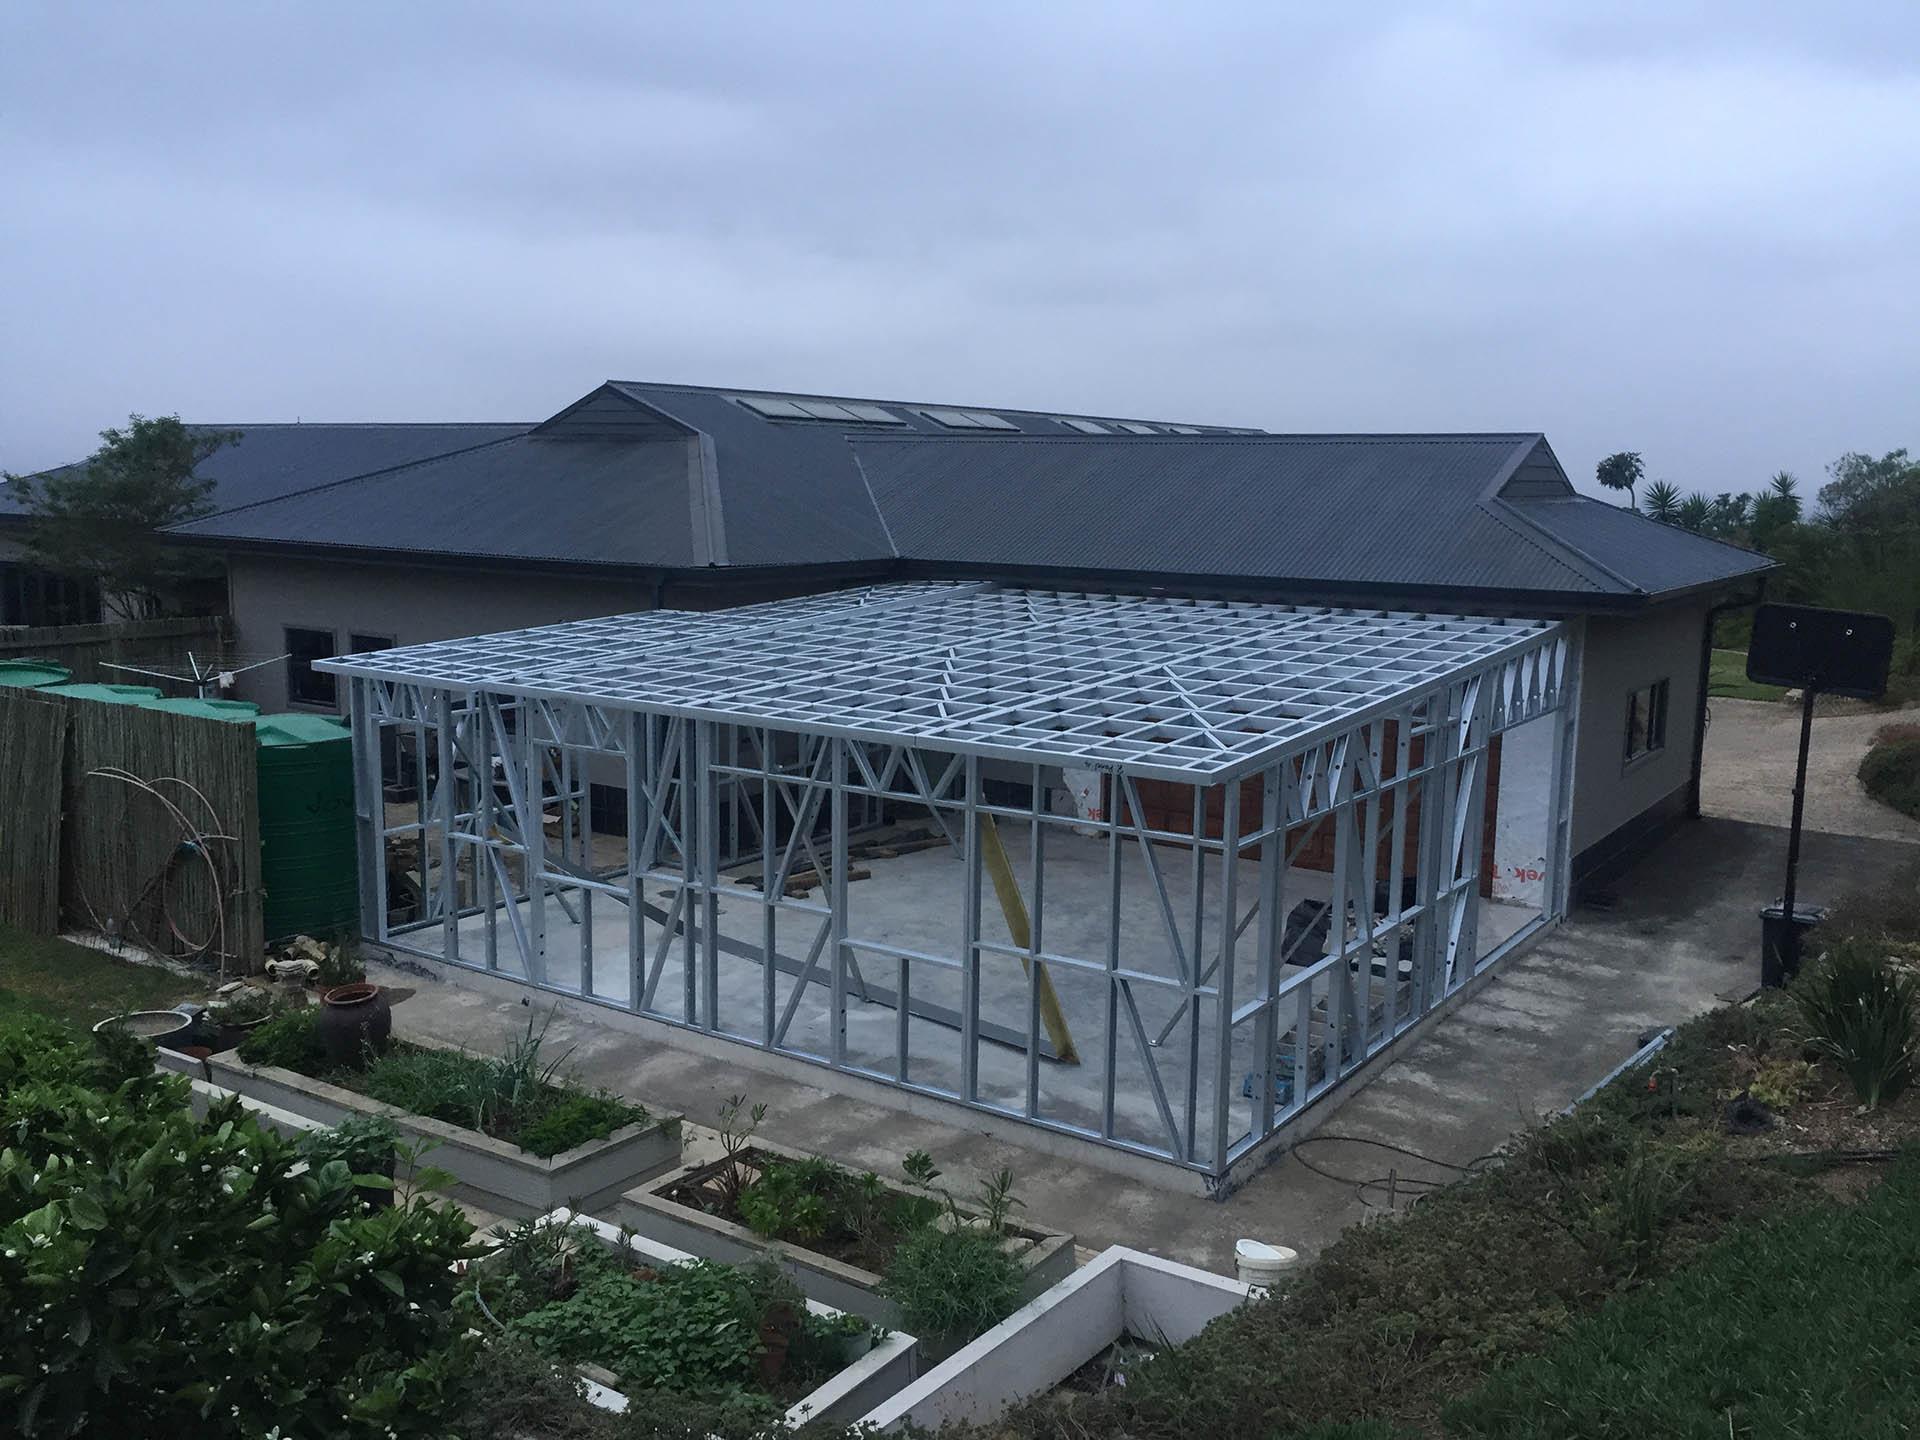 house kahler - extension shospec-project-light-steel-frame-building-LSF-construction-pietermaritzburg